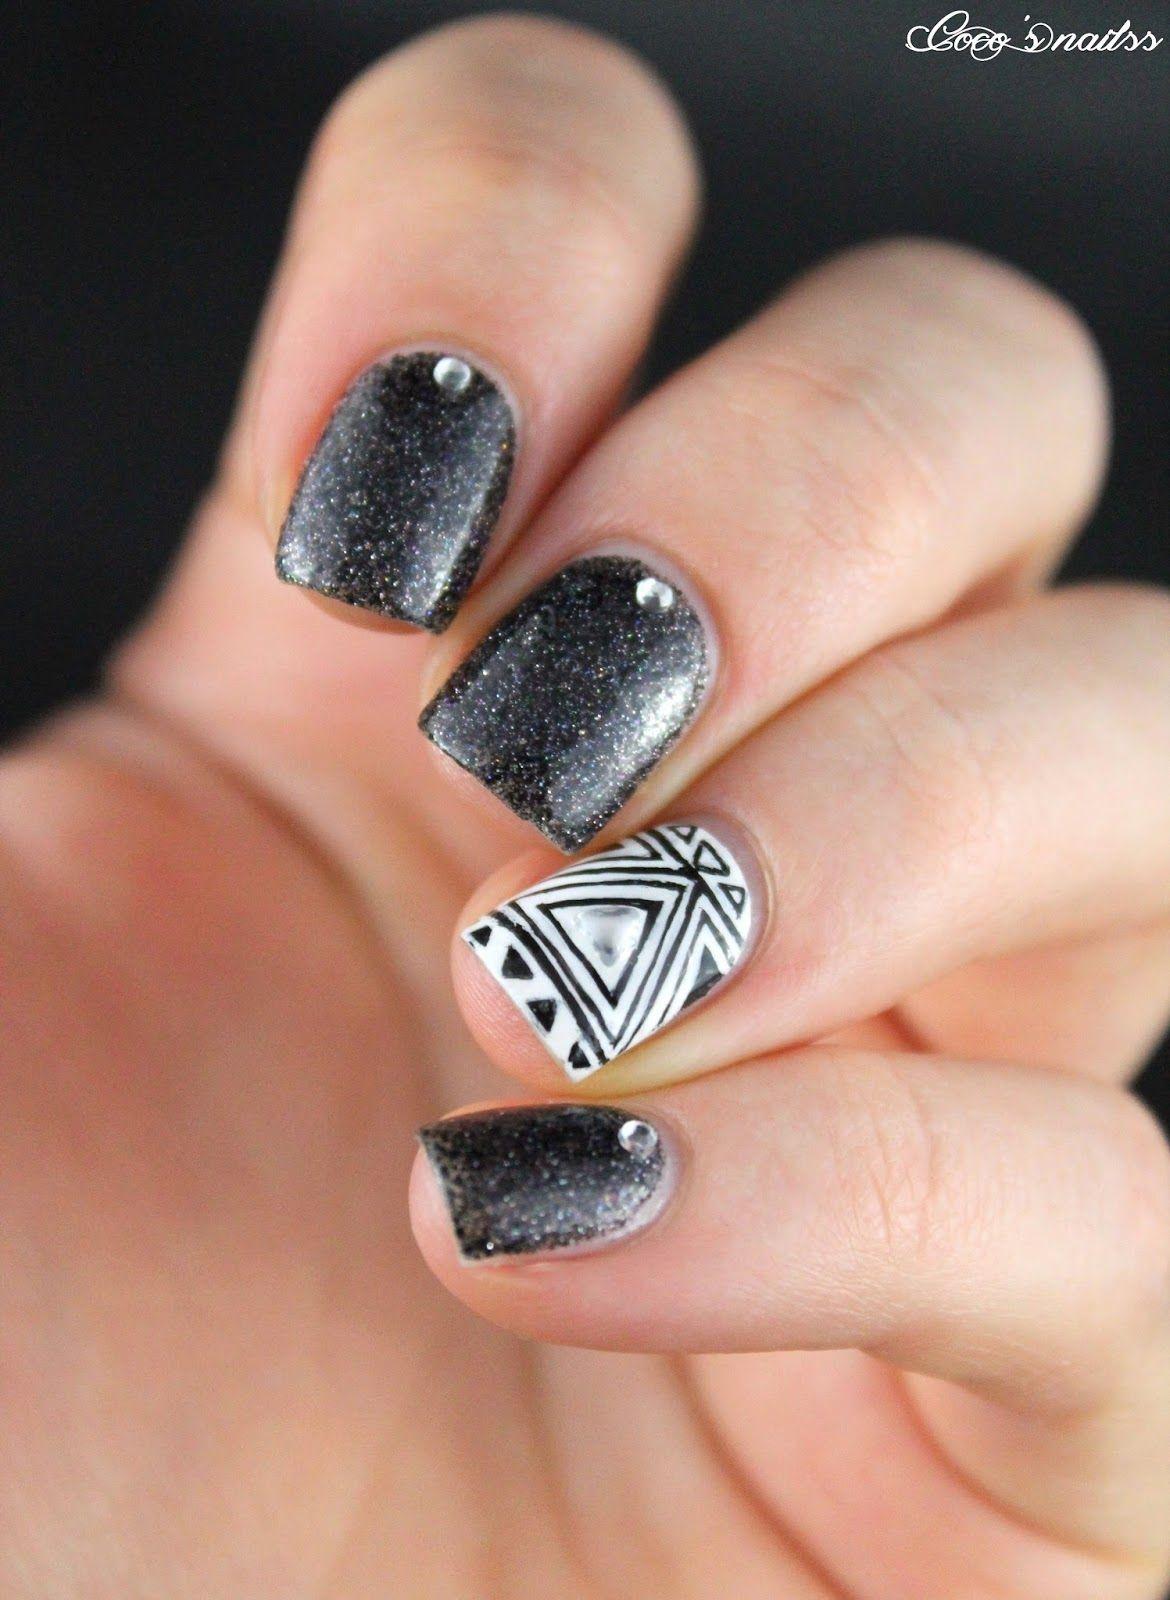 Black u white plain nails geometric nail art and stamping nail art